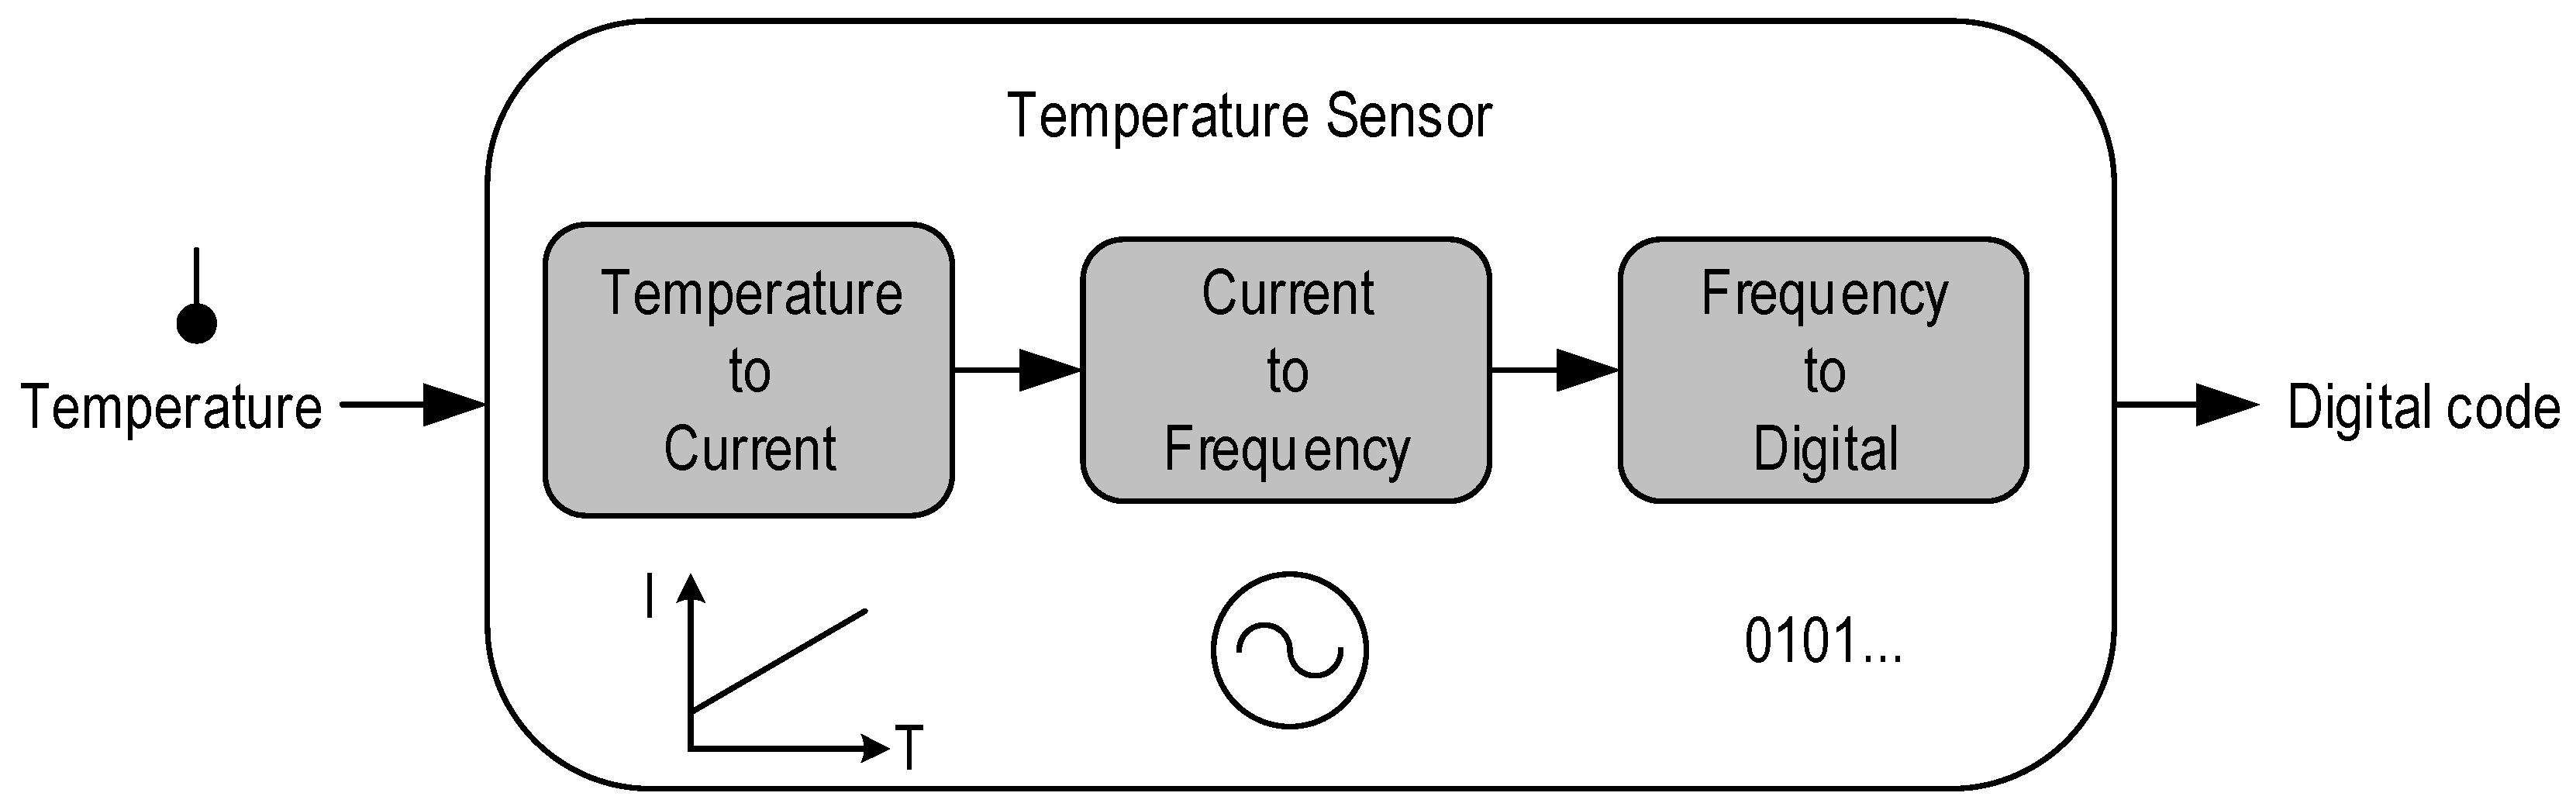 how to simplify block diagrams 1989 honda accord fuel pump wiring diagram jlpea free full text a 2 v 23 nw cmos temperature